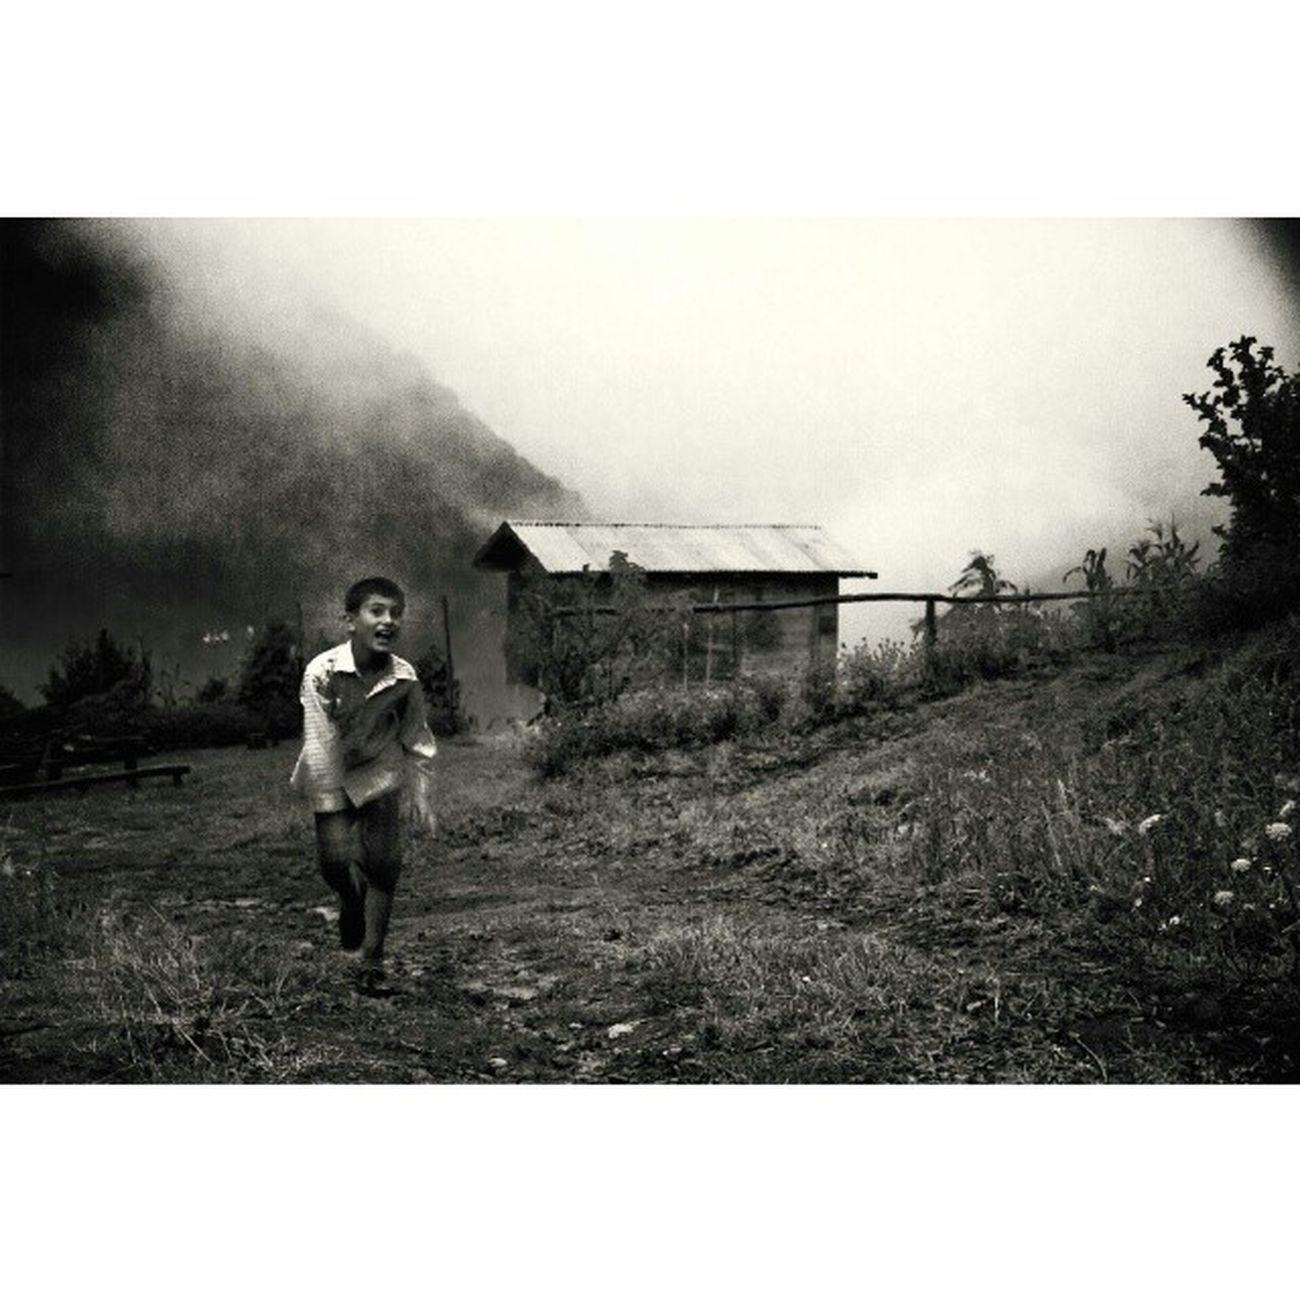 Hayatmavi Manzara Me Atlagel yokartik photo photoday dark king art samsun monochoreme bw jj_forum kopgel